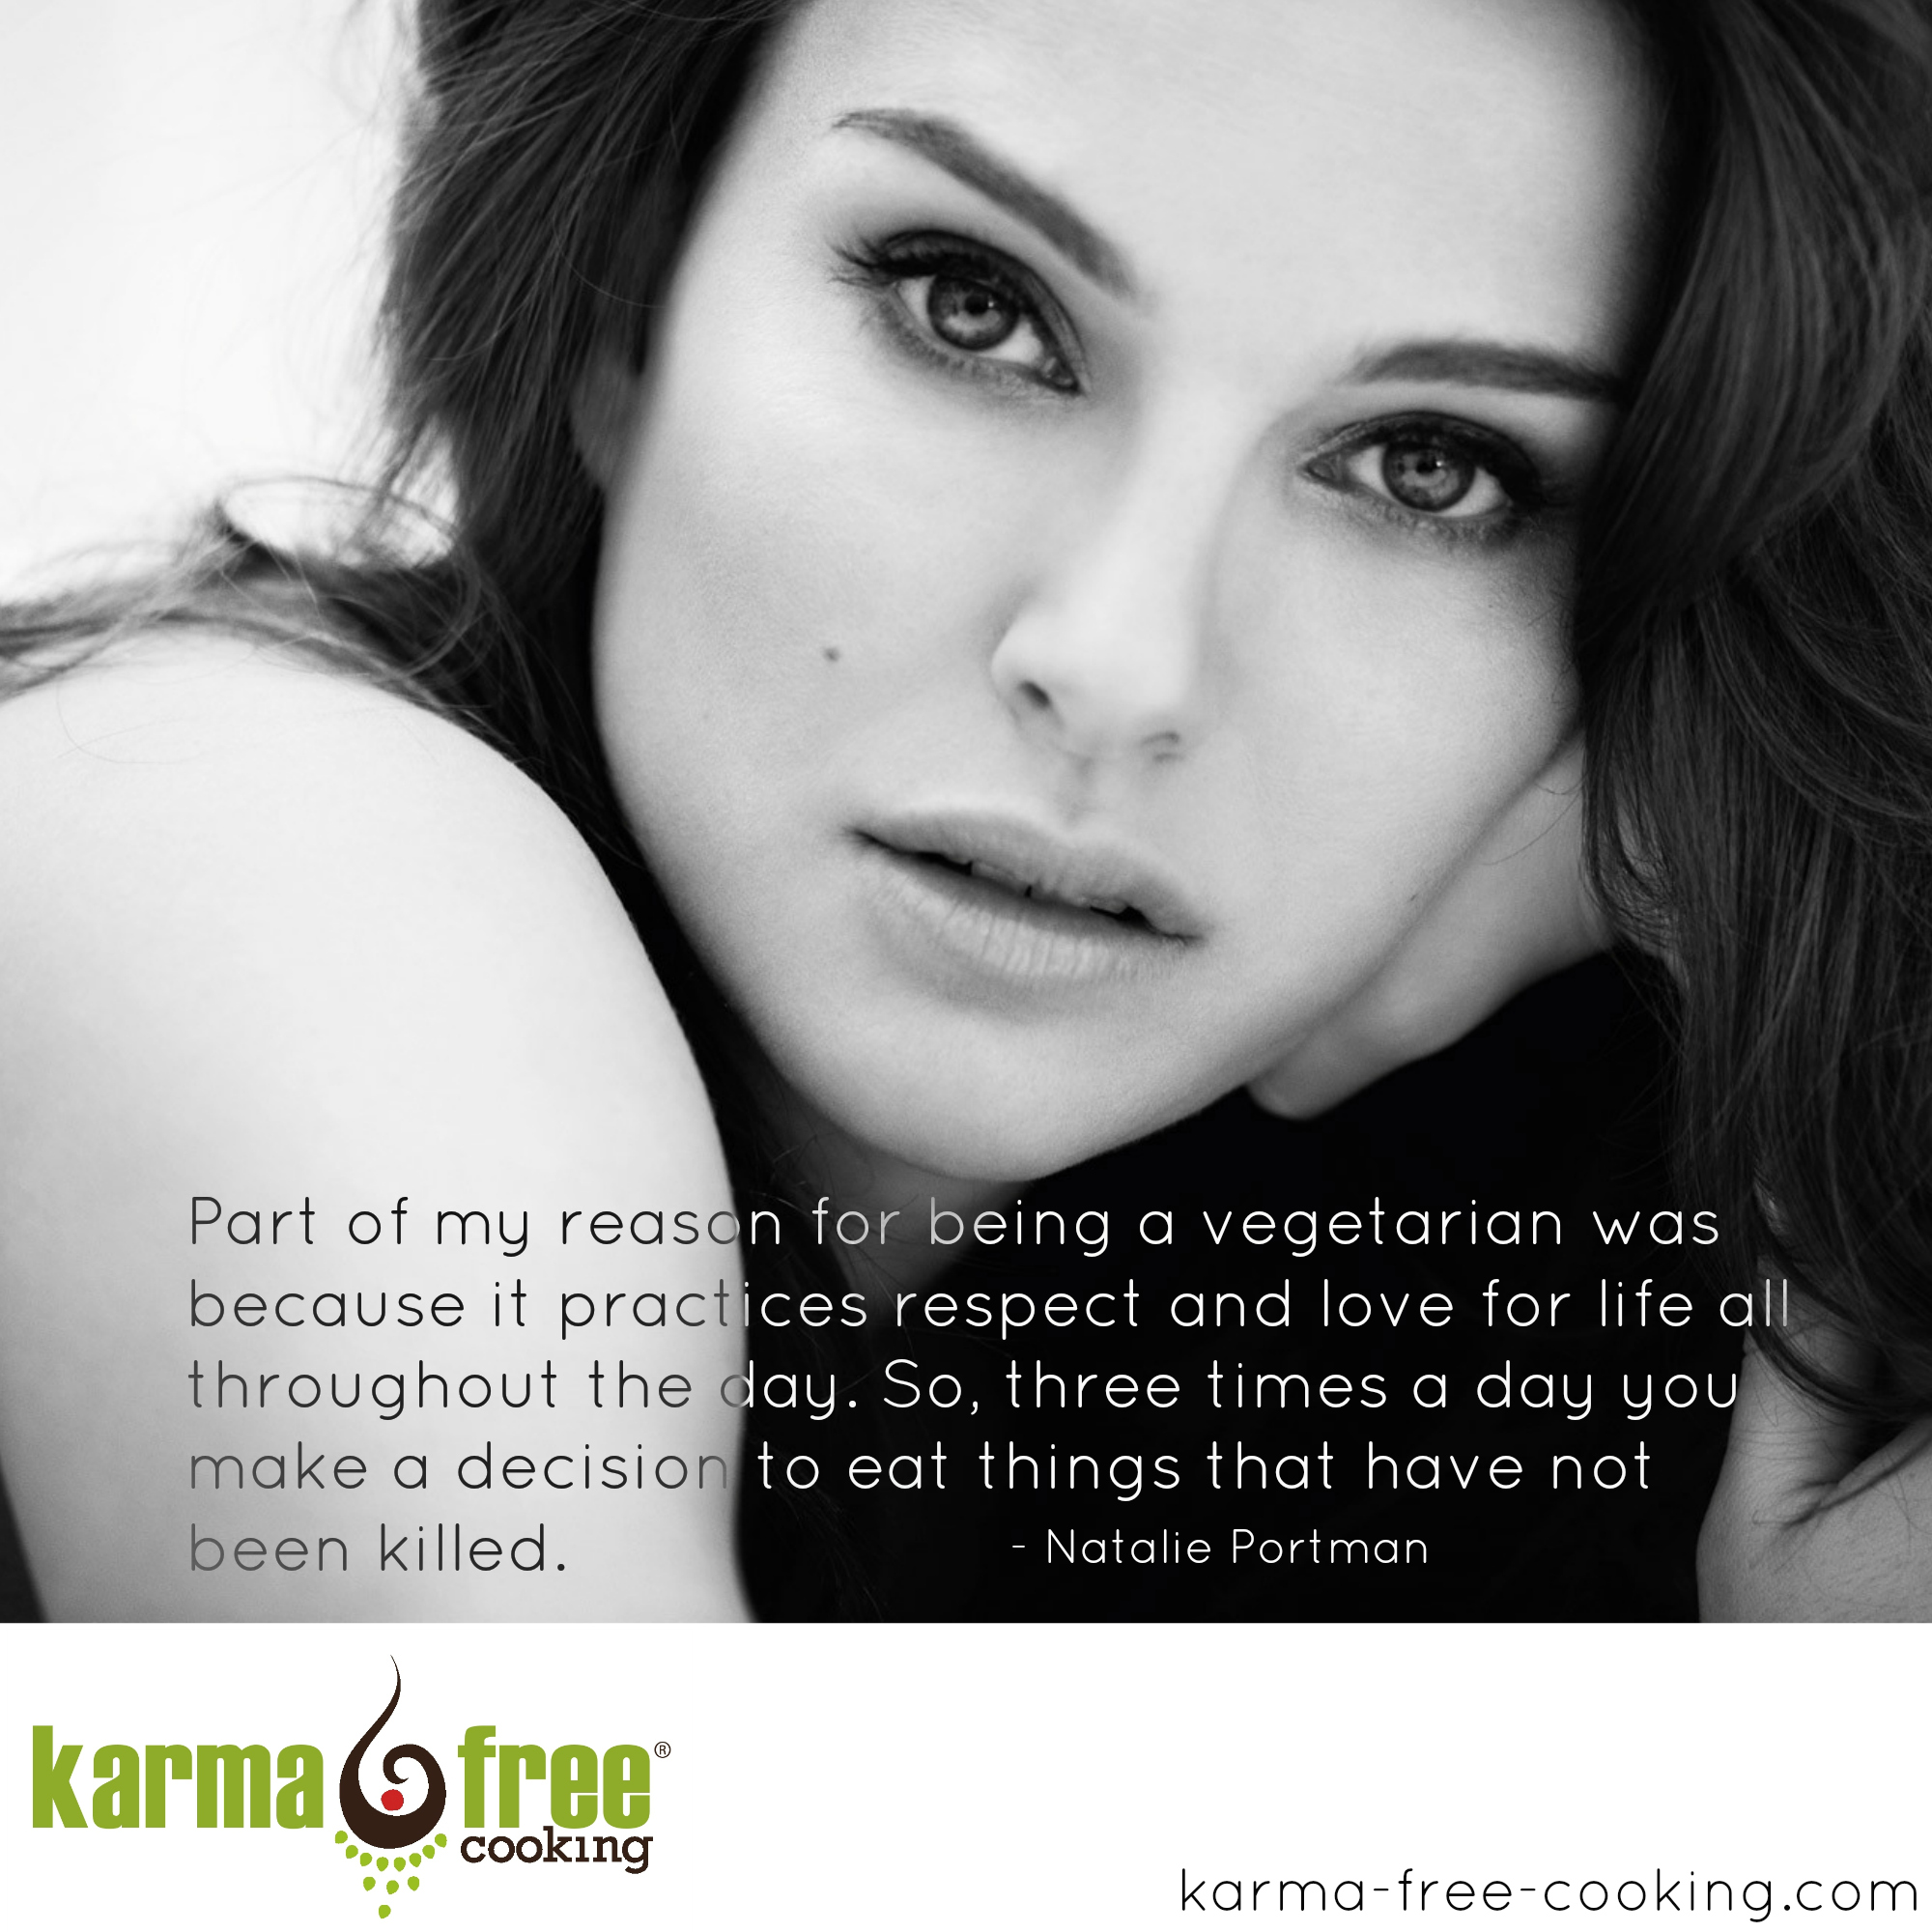 natalie portman quotes - photo #27